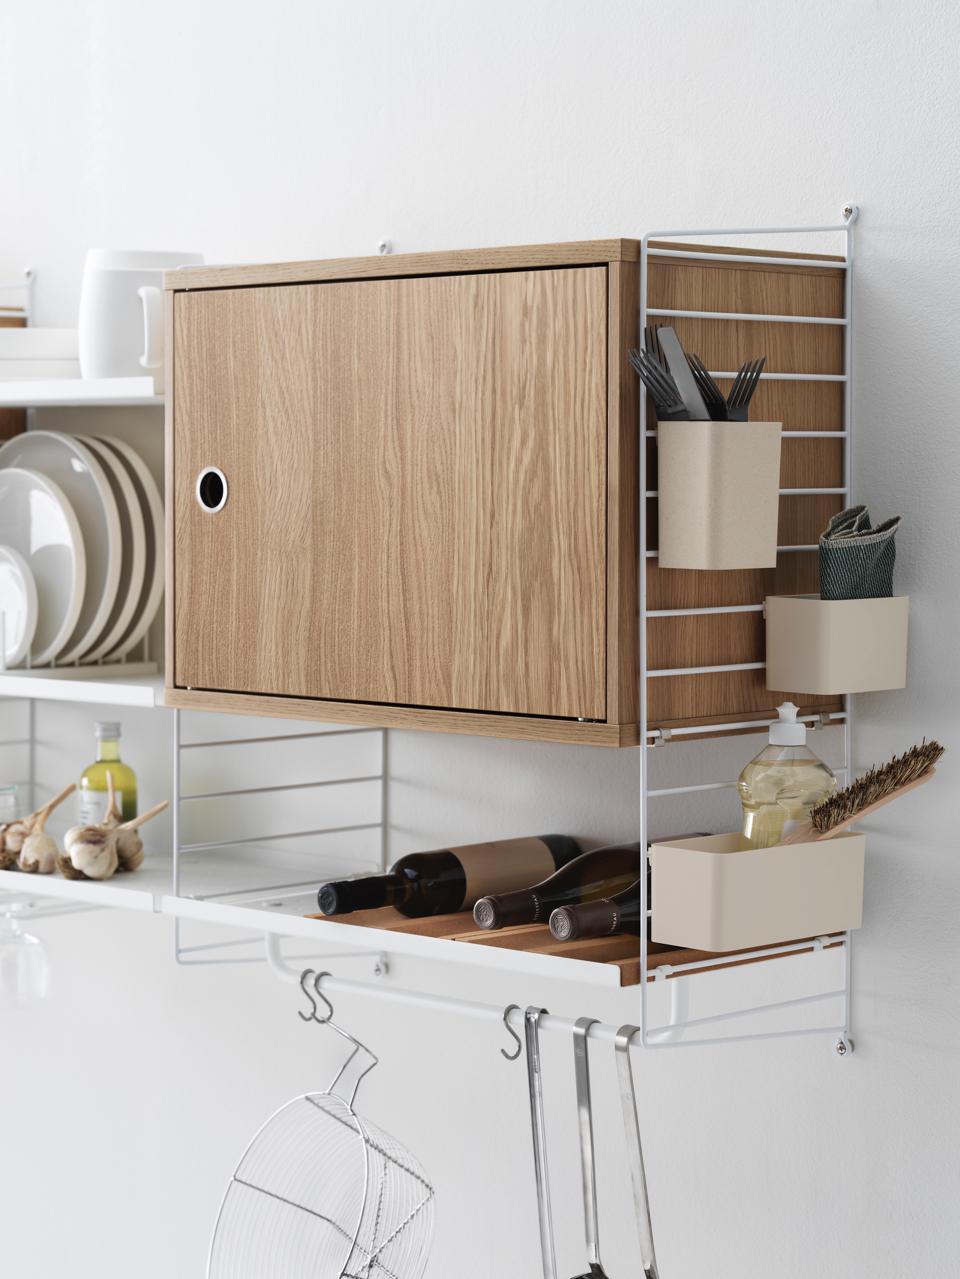 neue-kueche-trends-decohome.de-regal-oberschrank-string_furniture_drehtuerschrank_flascheneinsatz_organizer